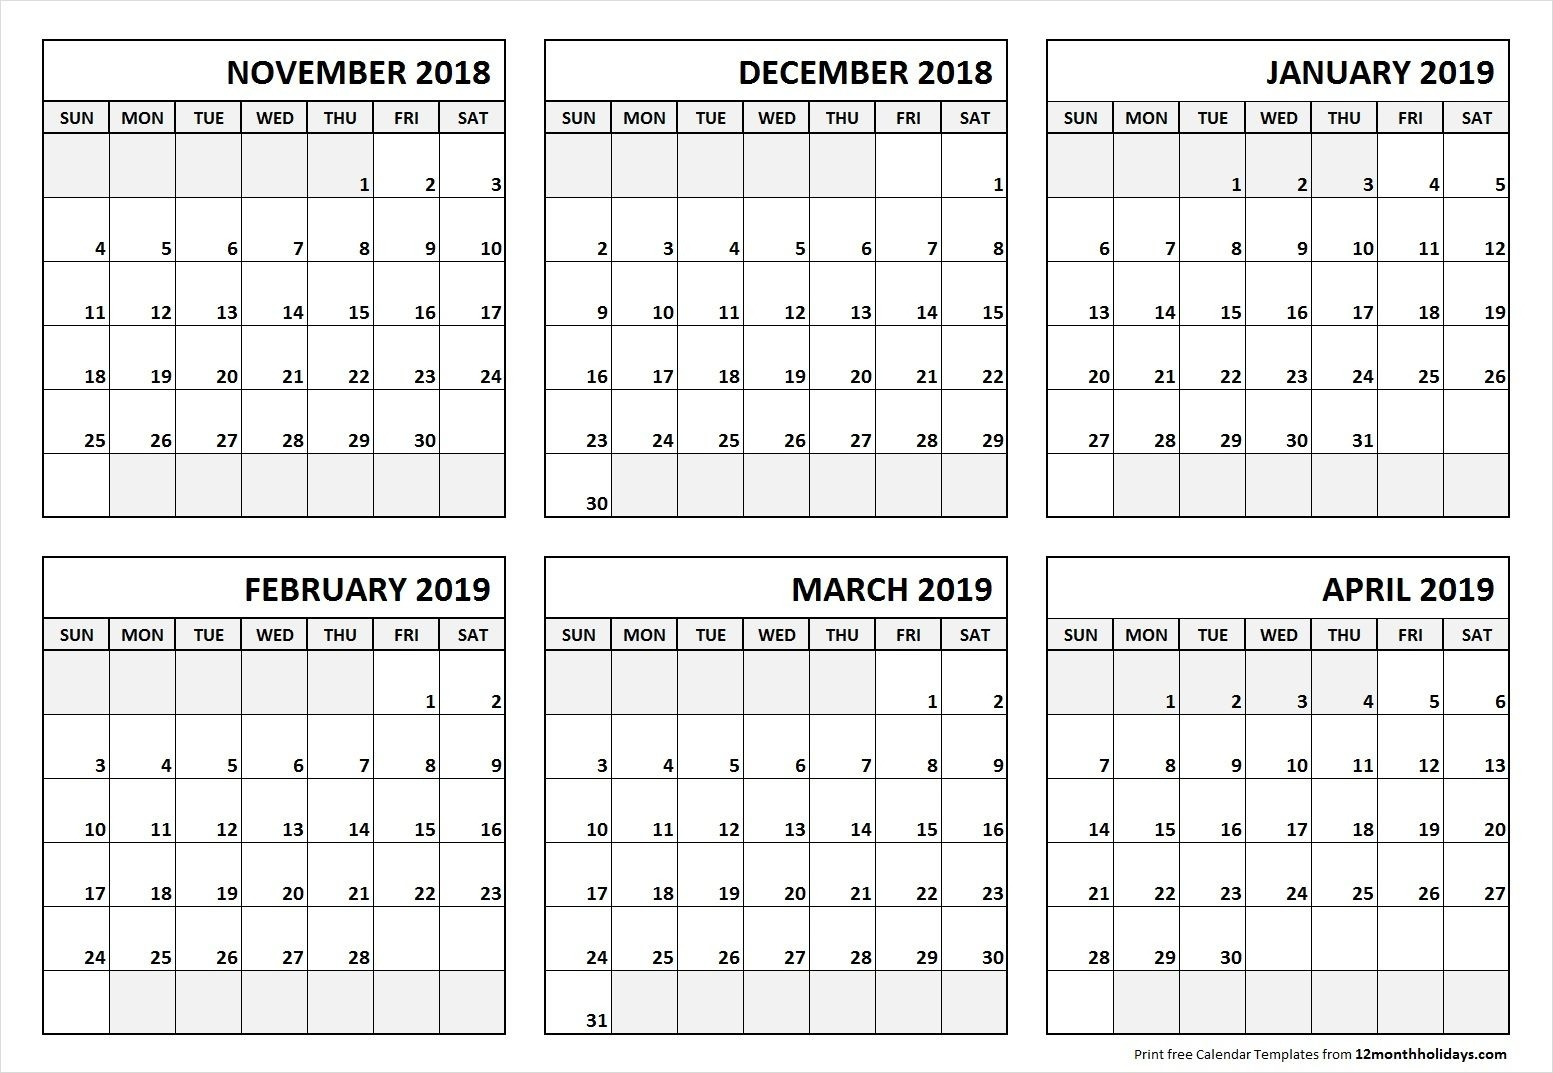 6 Month Calendar November 2018 To April 2019 | November 2018 To 6 Month Calendar Blank